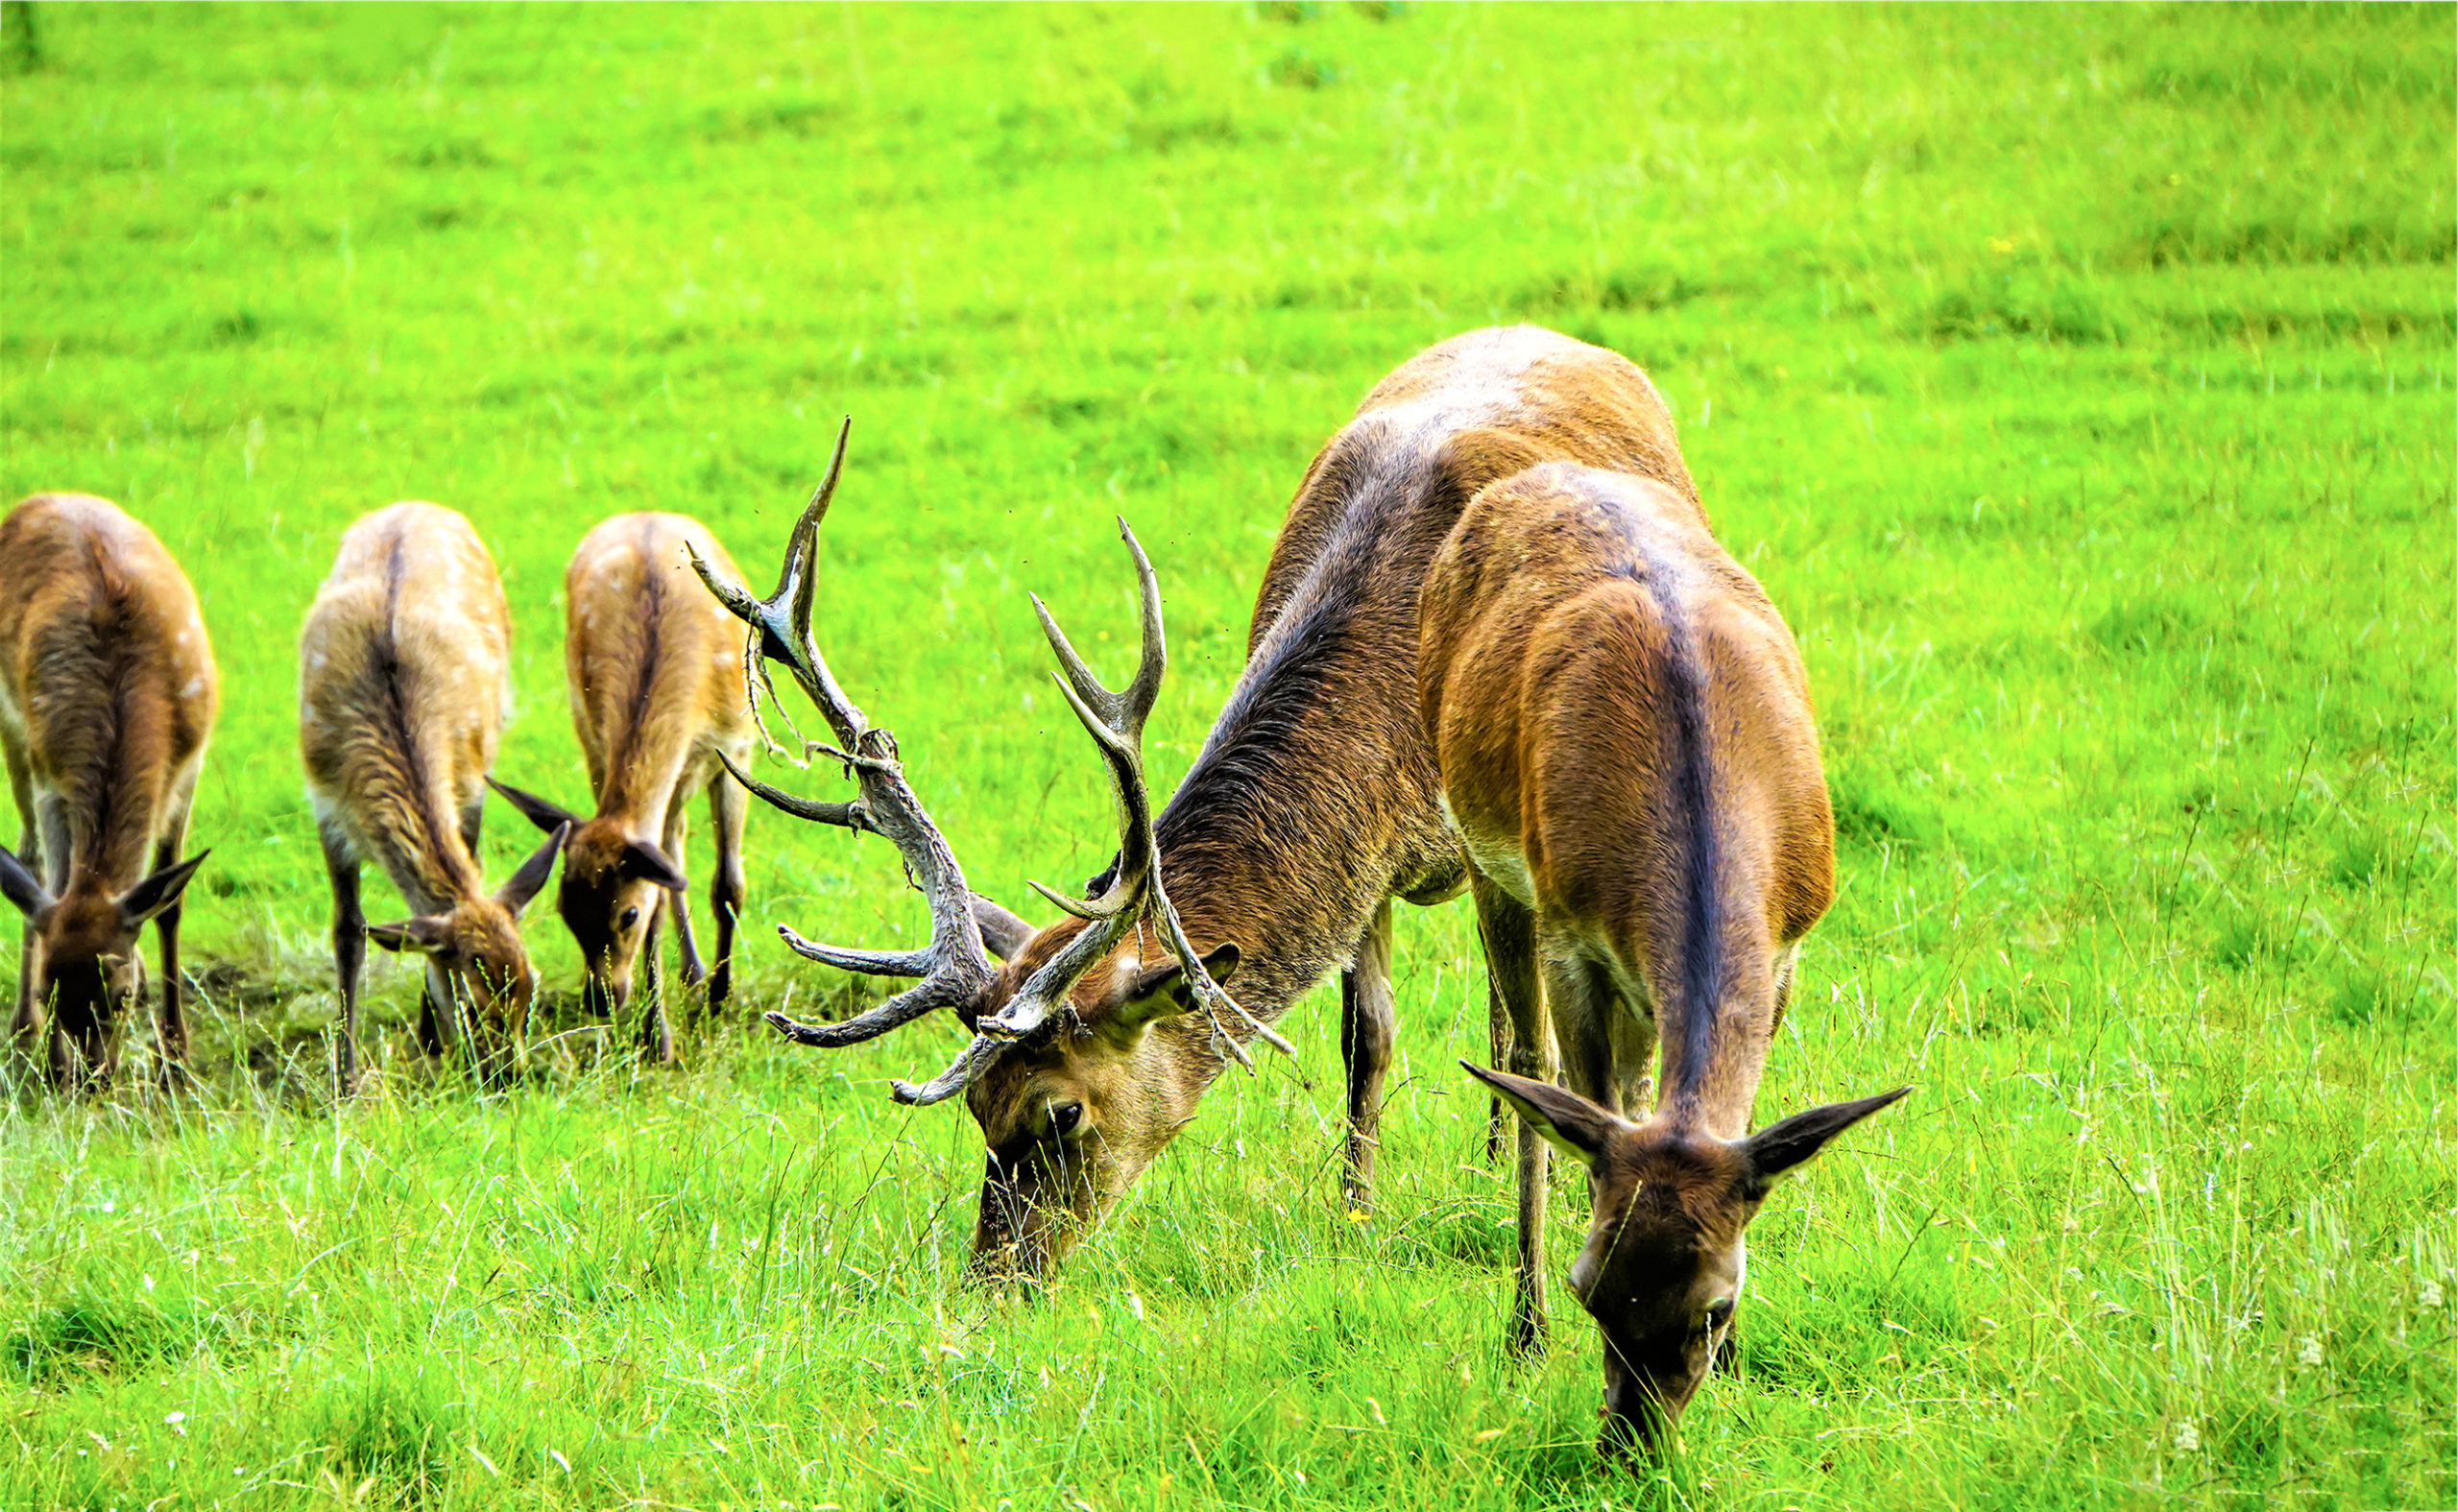 Deer in a field - TB Hub